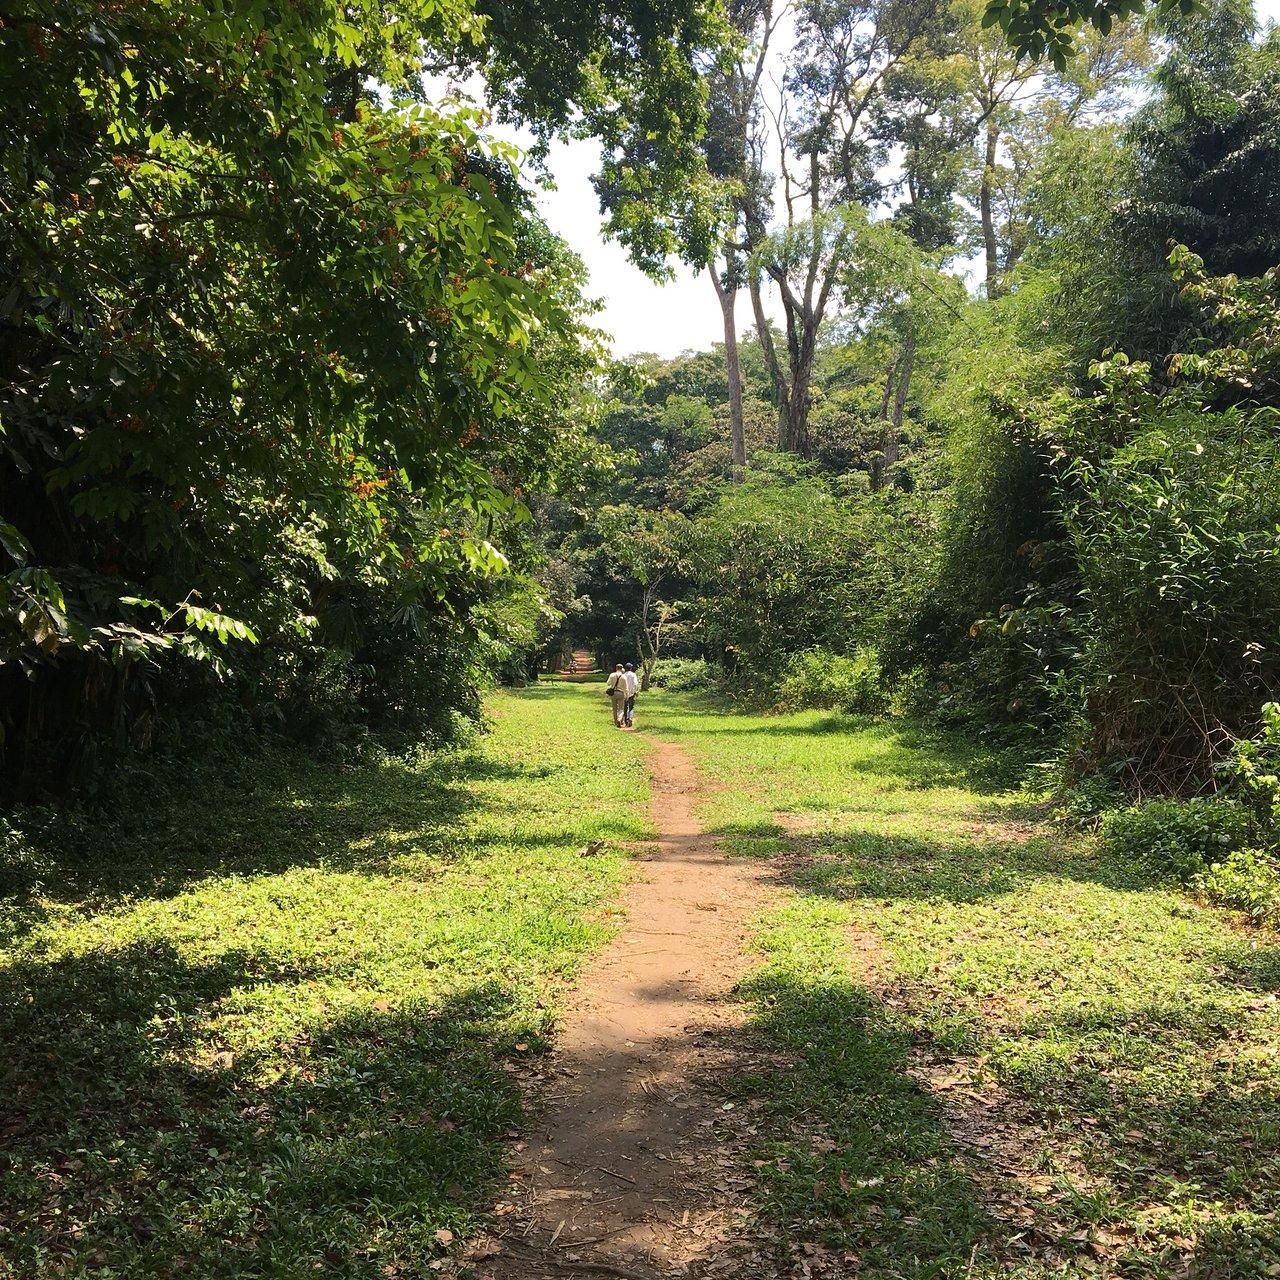 Jardin Botanique Best Of Jardin Botanique De Kisantu 2020 All You Need to Know